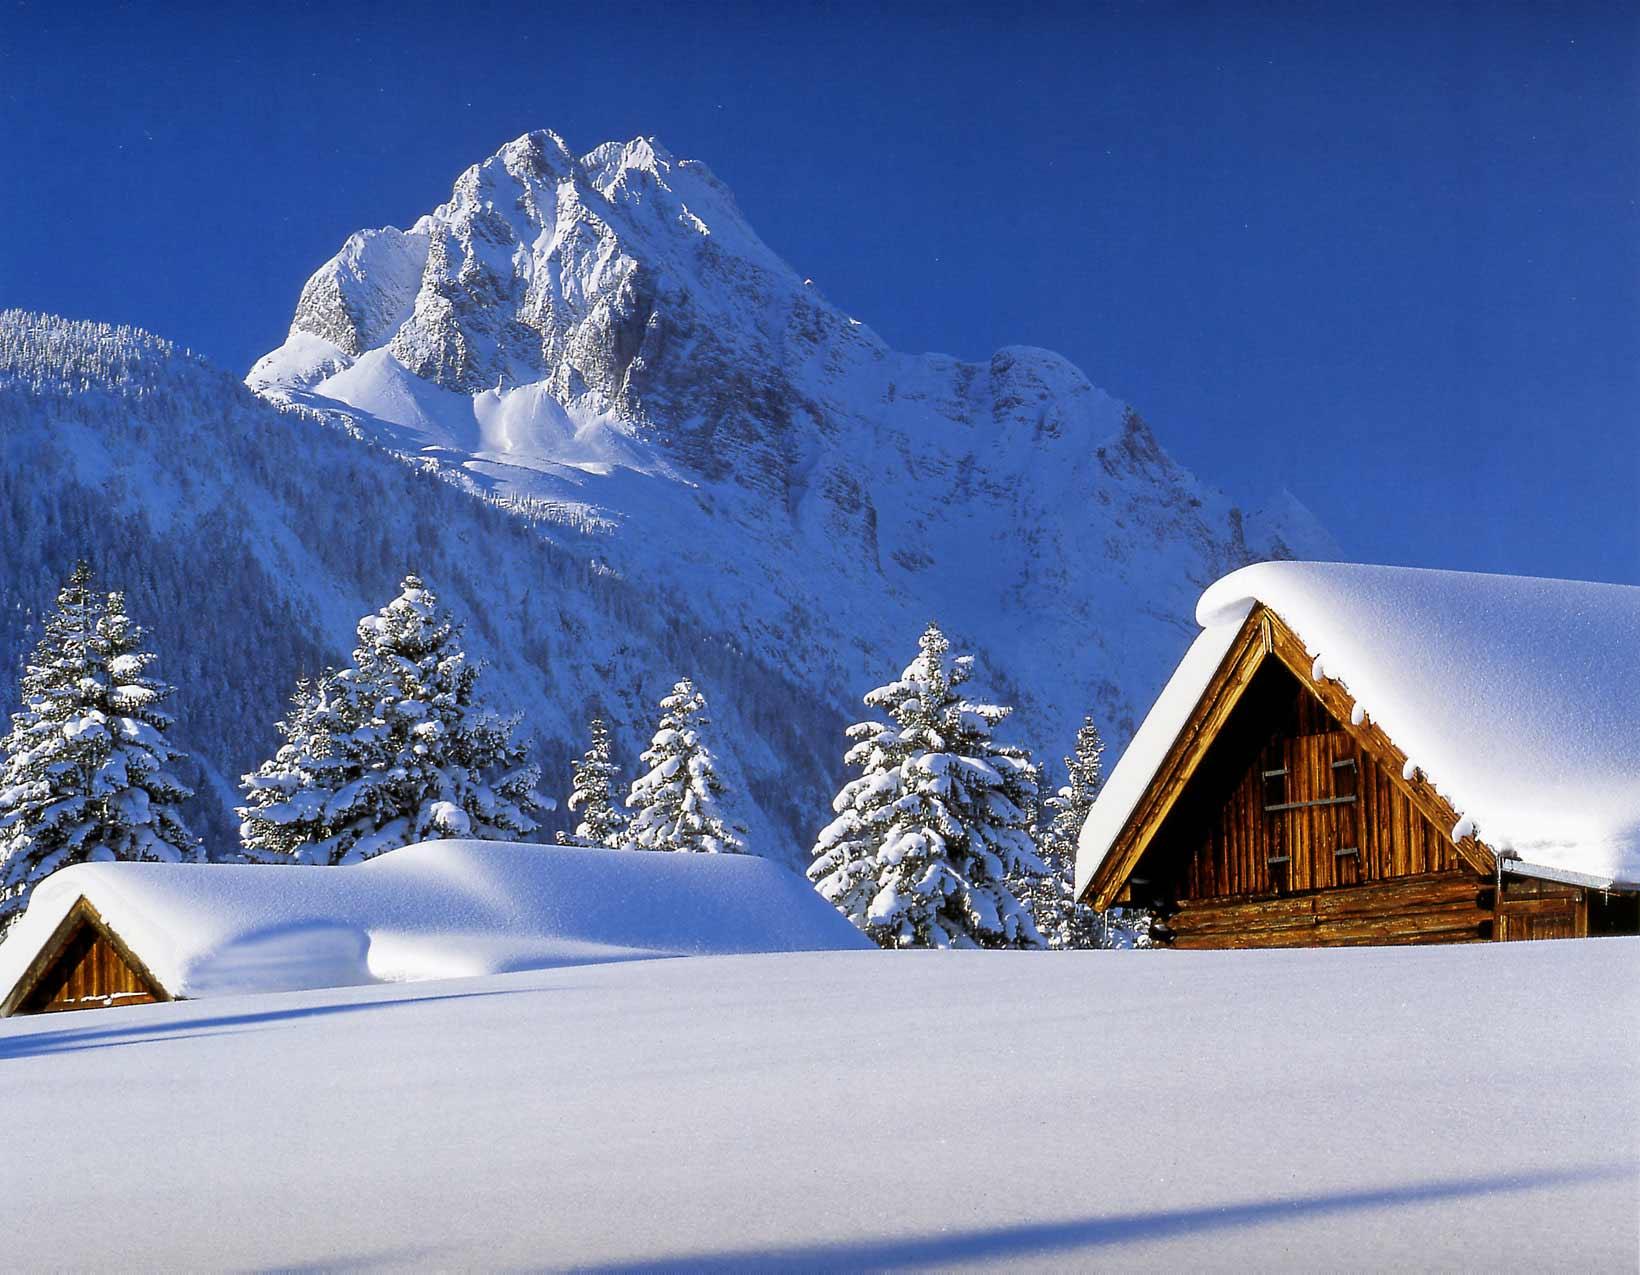 snow wallpaper 1640x1275